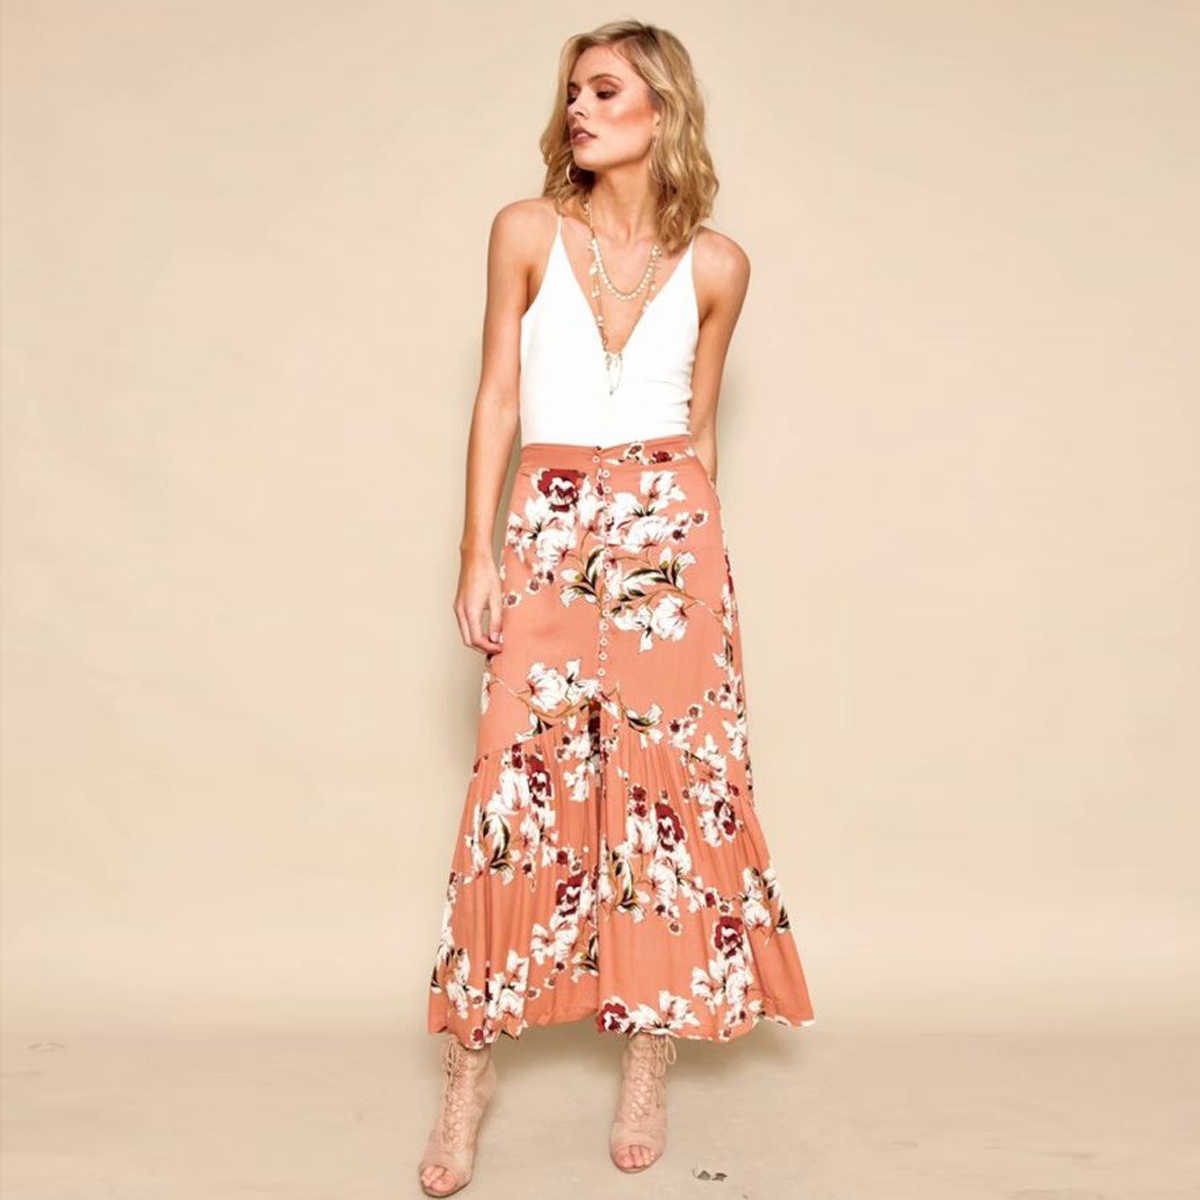 318f922c360 Jastie Vintage Floral Print Skirt Button Front Boho Hippie Split Sexy Long  Skirts Casual Beach Skirt Women 2018 Summer Skirts